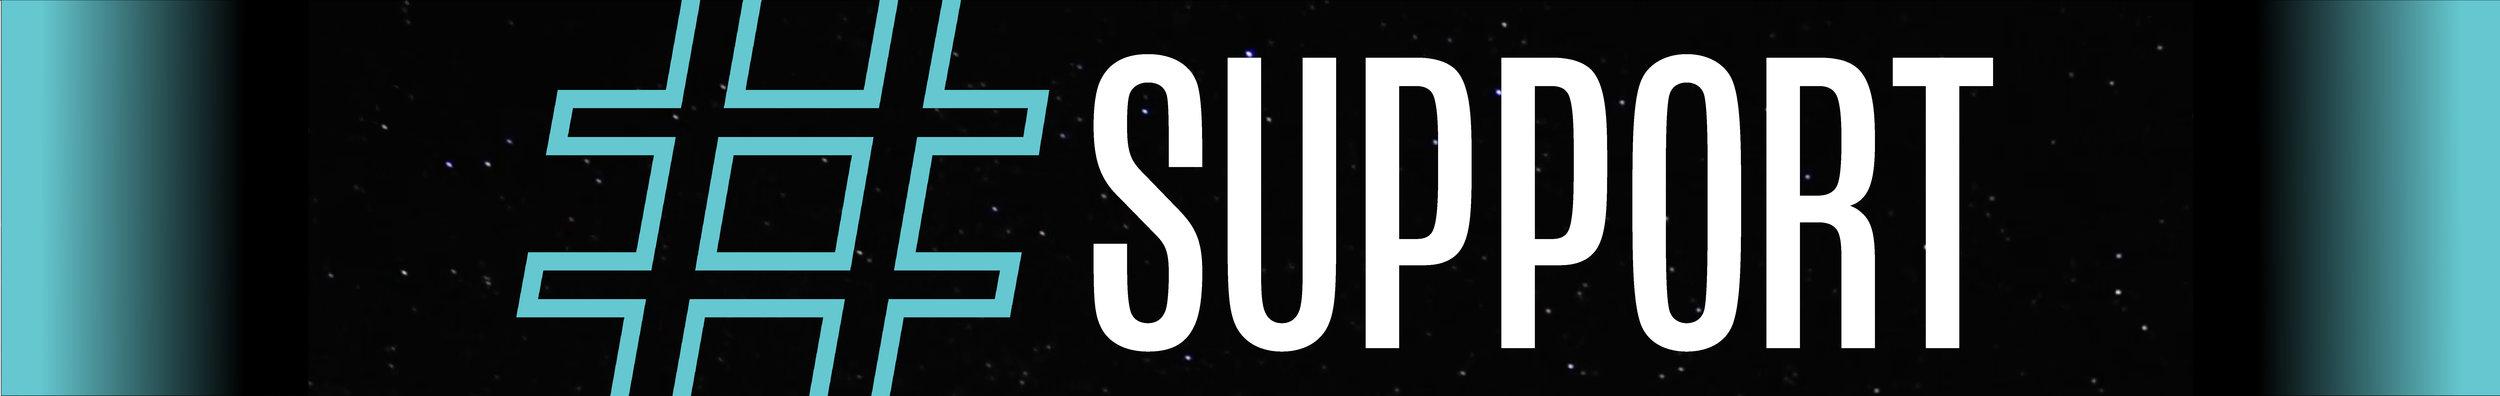 # SUPPORT BLACK COVER-01-01.jpg